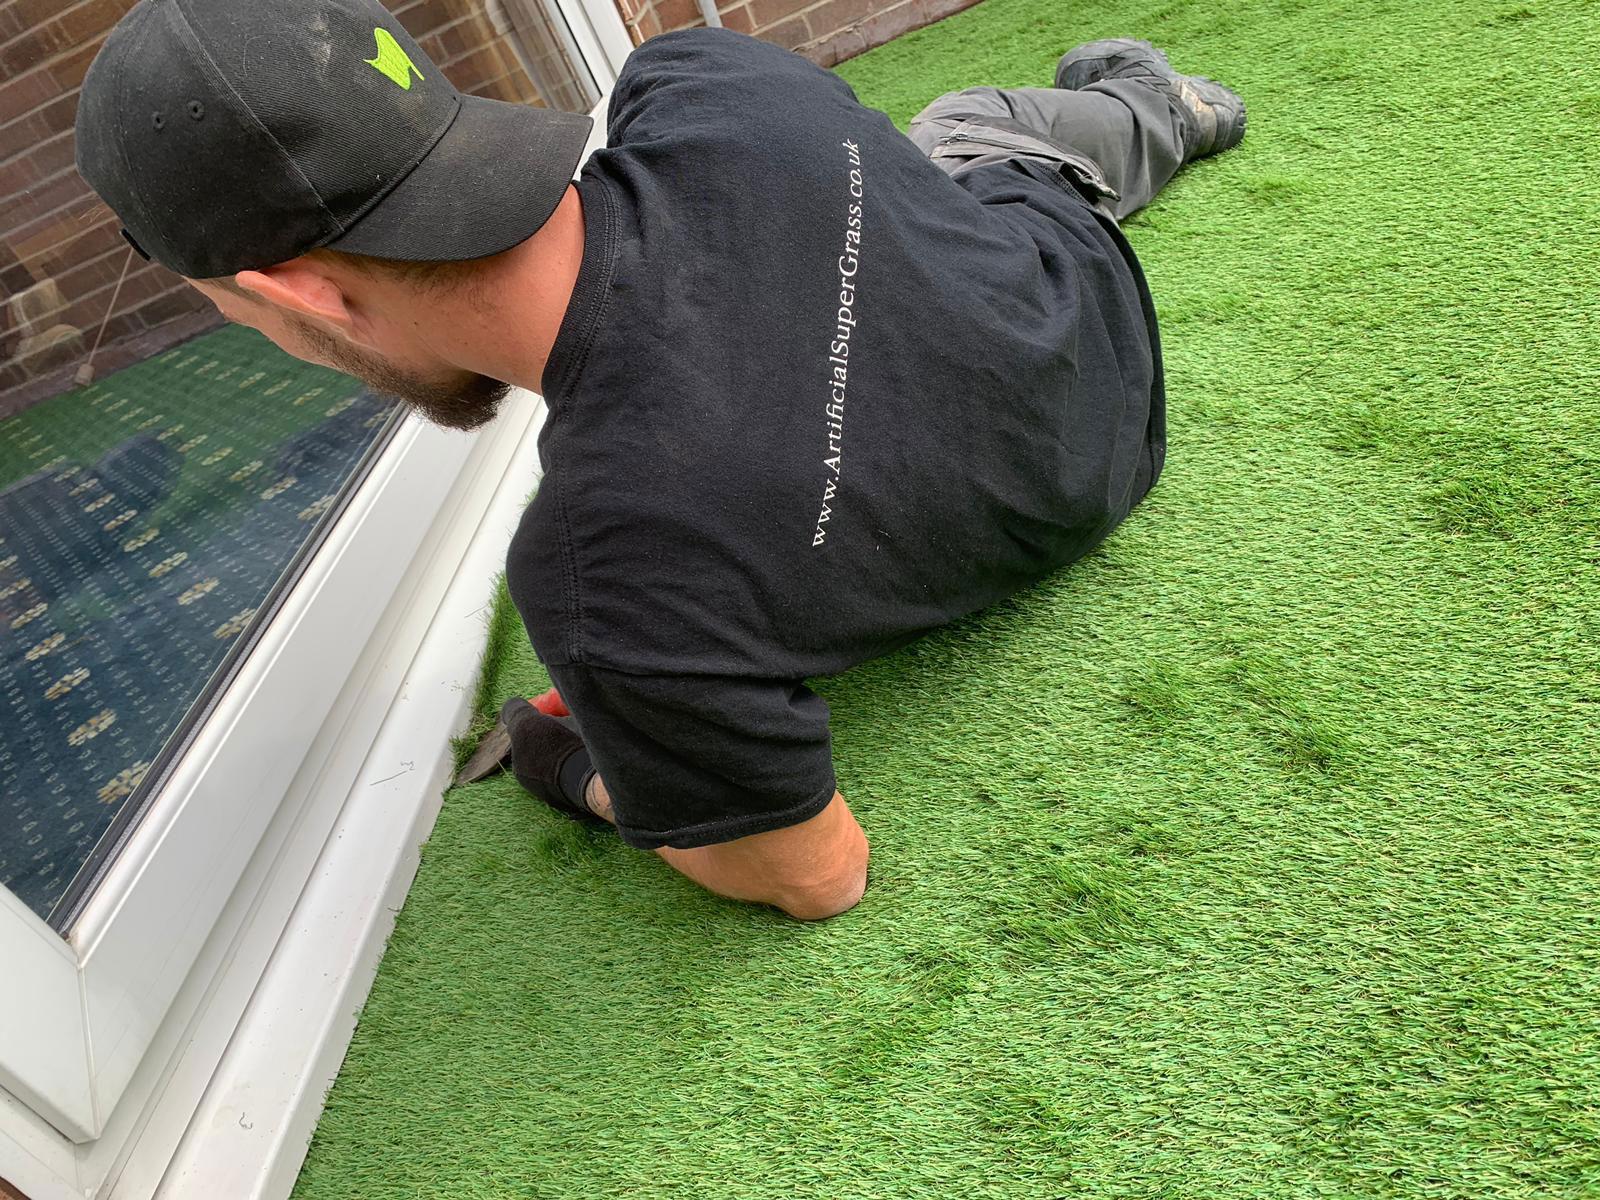 Plastic Grass Boroughbridge Artificial Super Grass